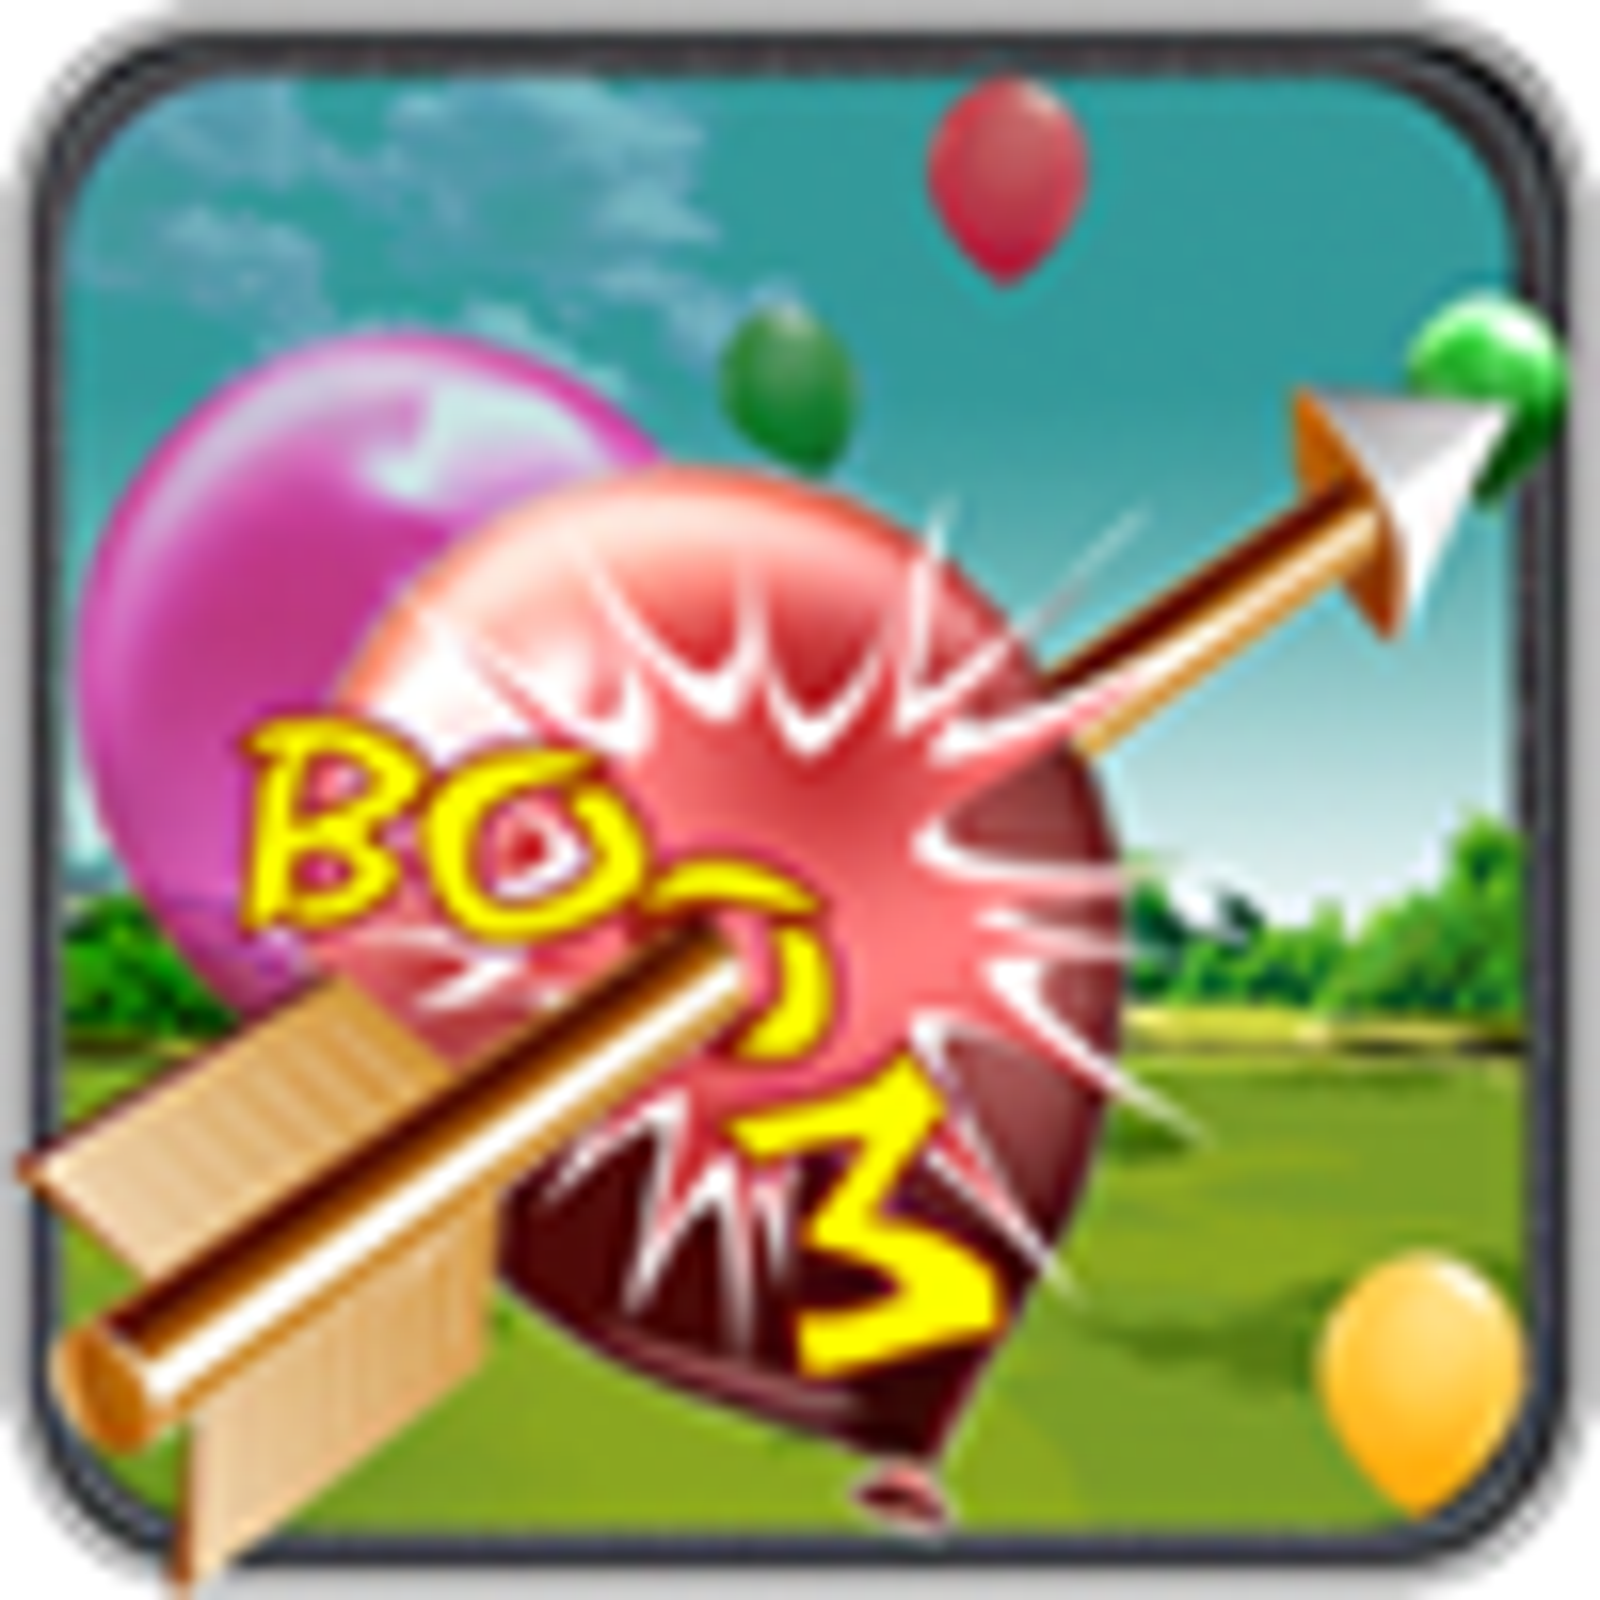 Bow Arrow and Balloon